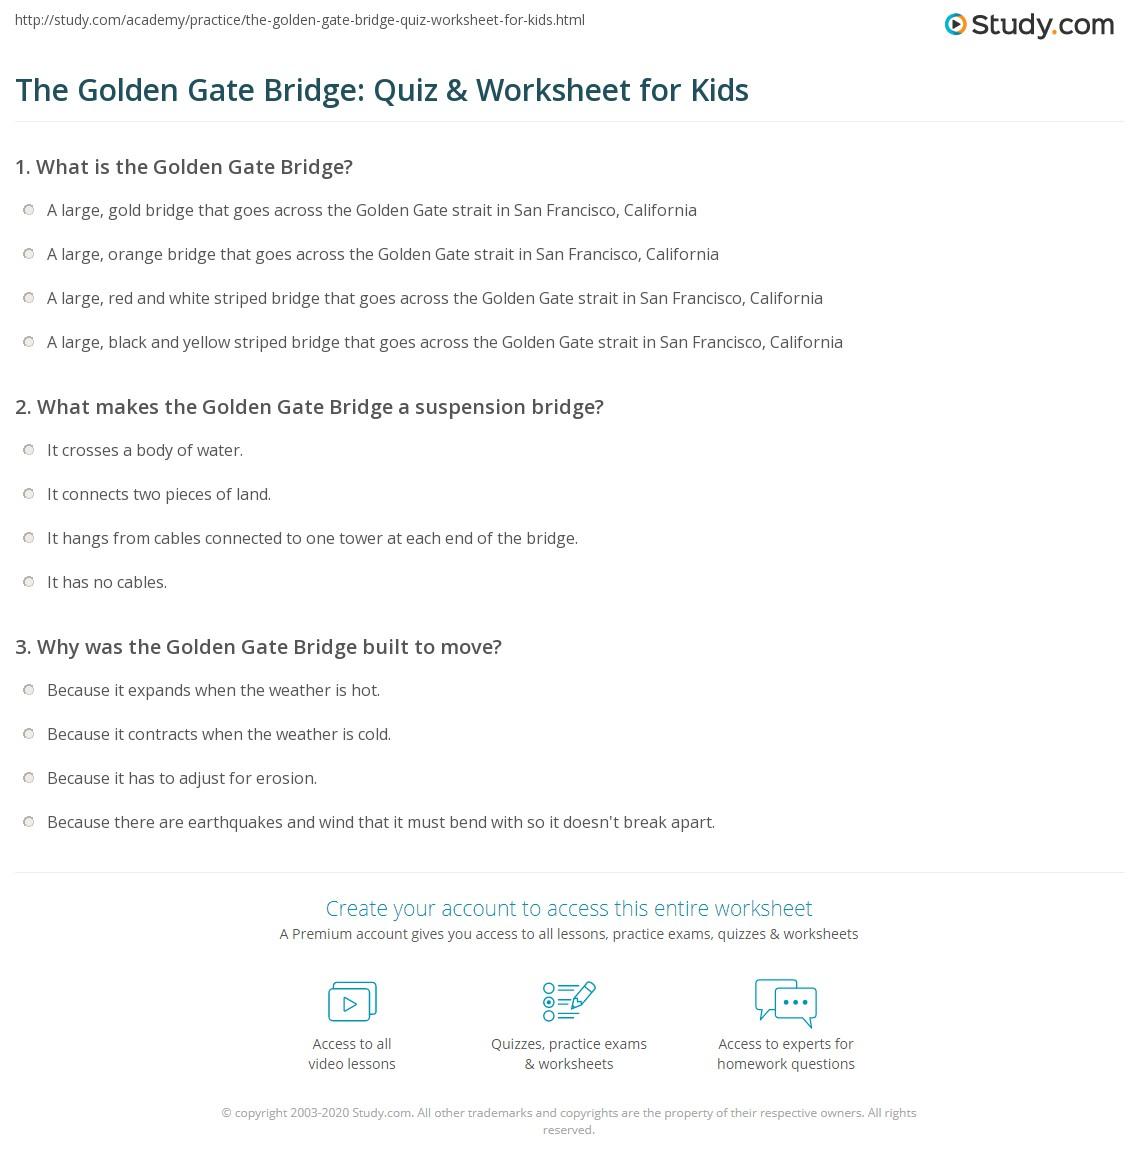 Printable coloring pages golden gate bridge - Print Golden Gate Bridge Facts Lesson For Kids Worksheet